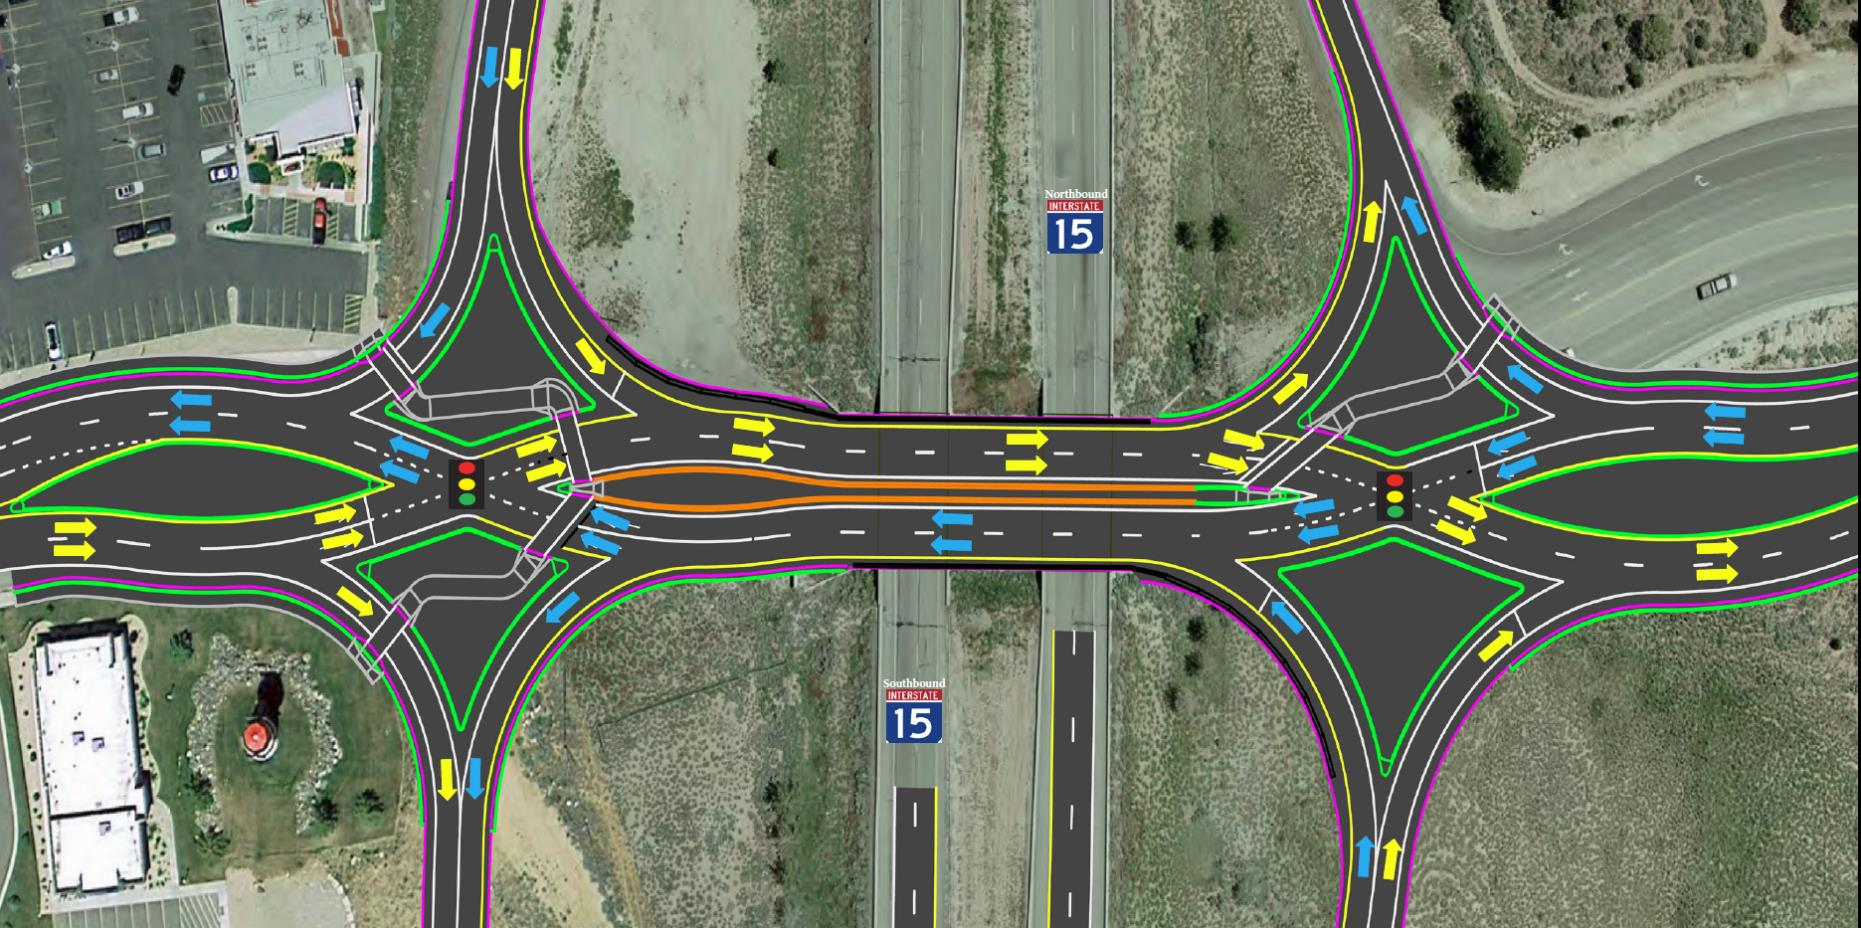 exit ramp traffic diagram human anatomy skin advisory cedar city 57 closure new